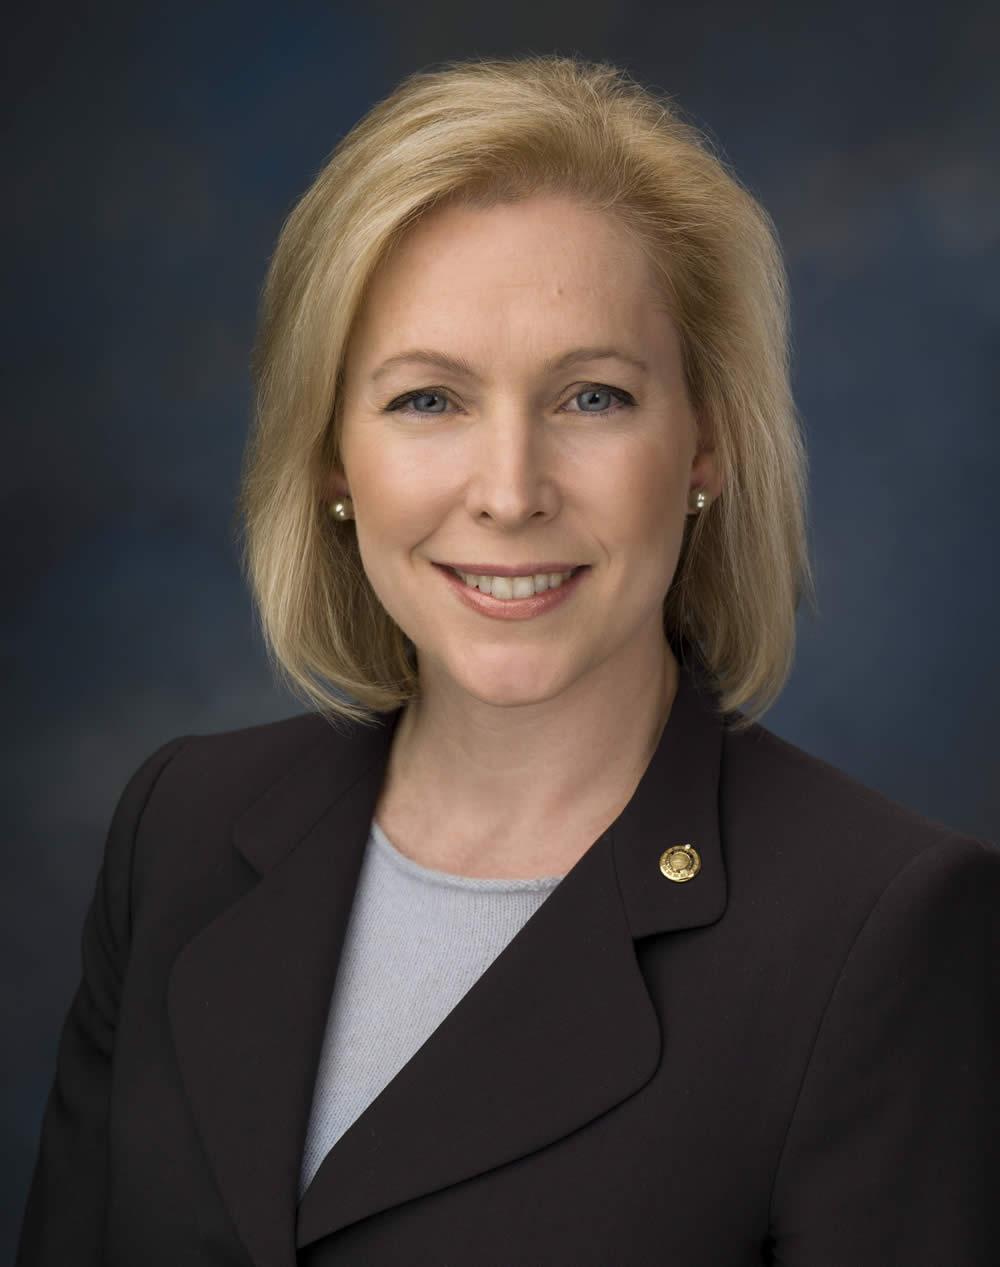 Kirsten_Gillibrand_official_Senate_portrait_2017.jpg